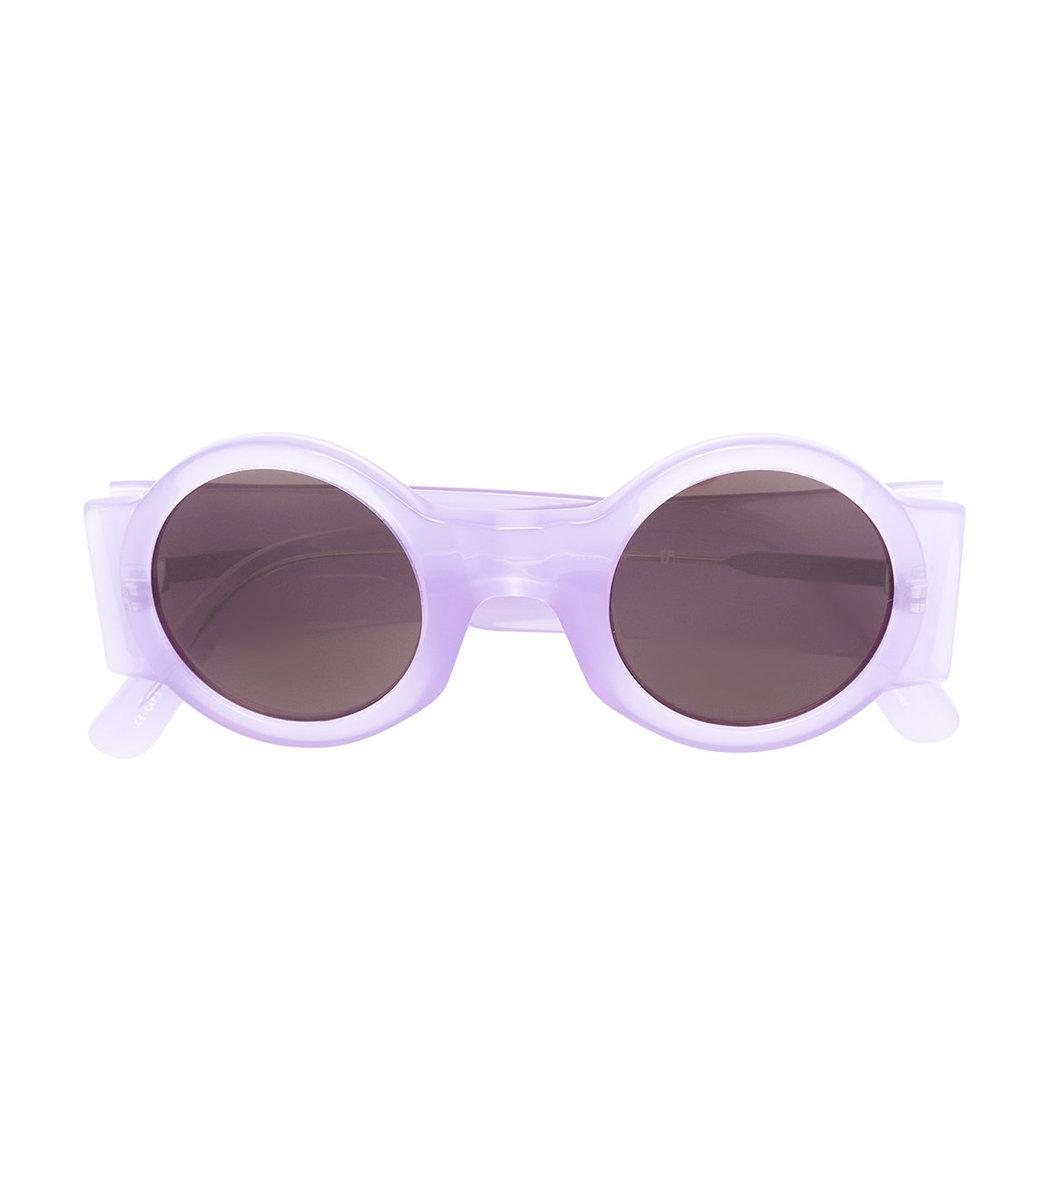 Linda Farriw | Linda Farrow Round Sunglasses | Linda Farrow Sunglasses